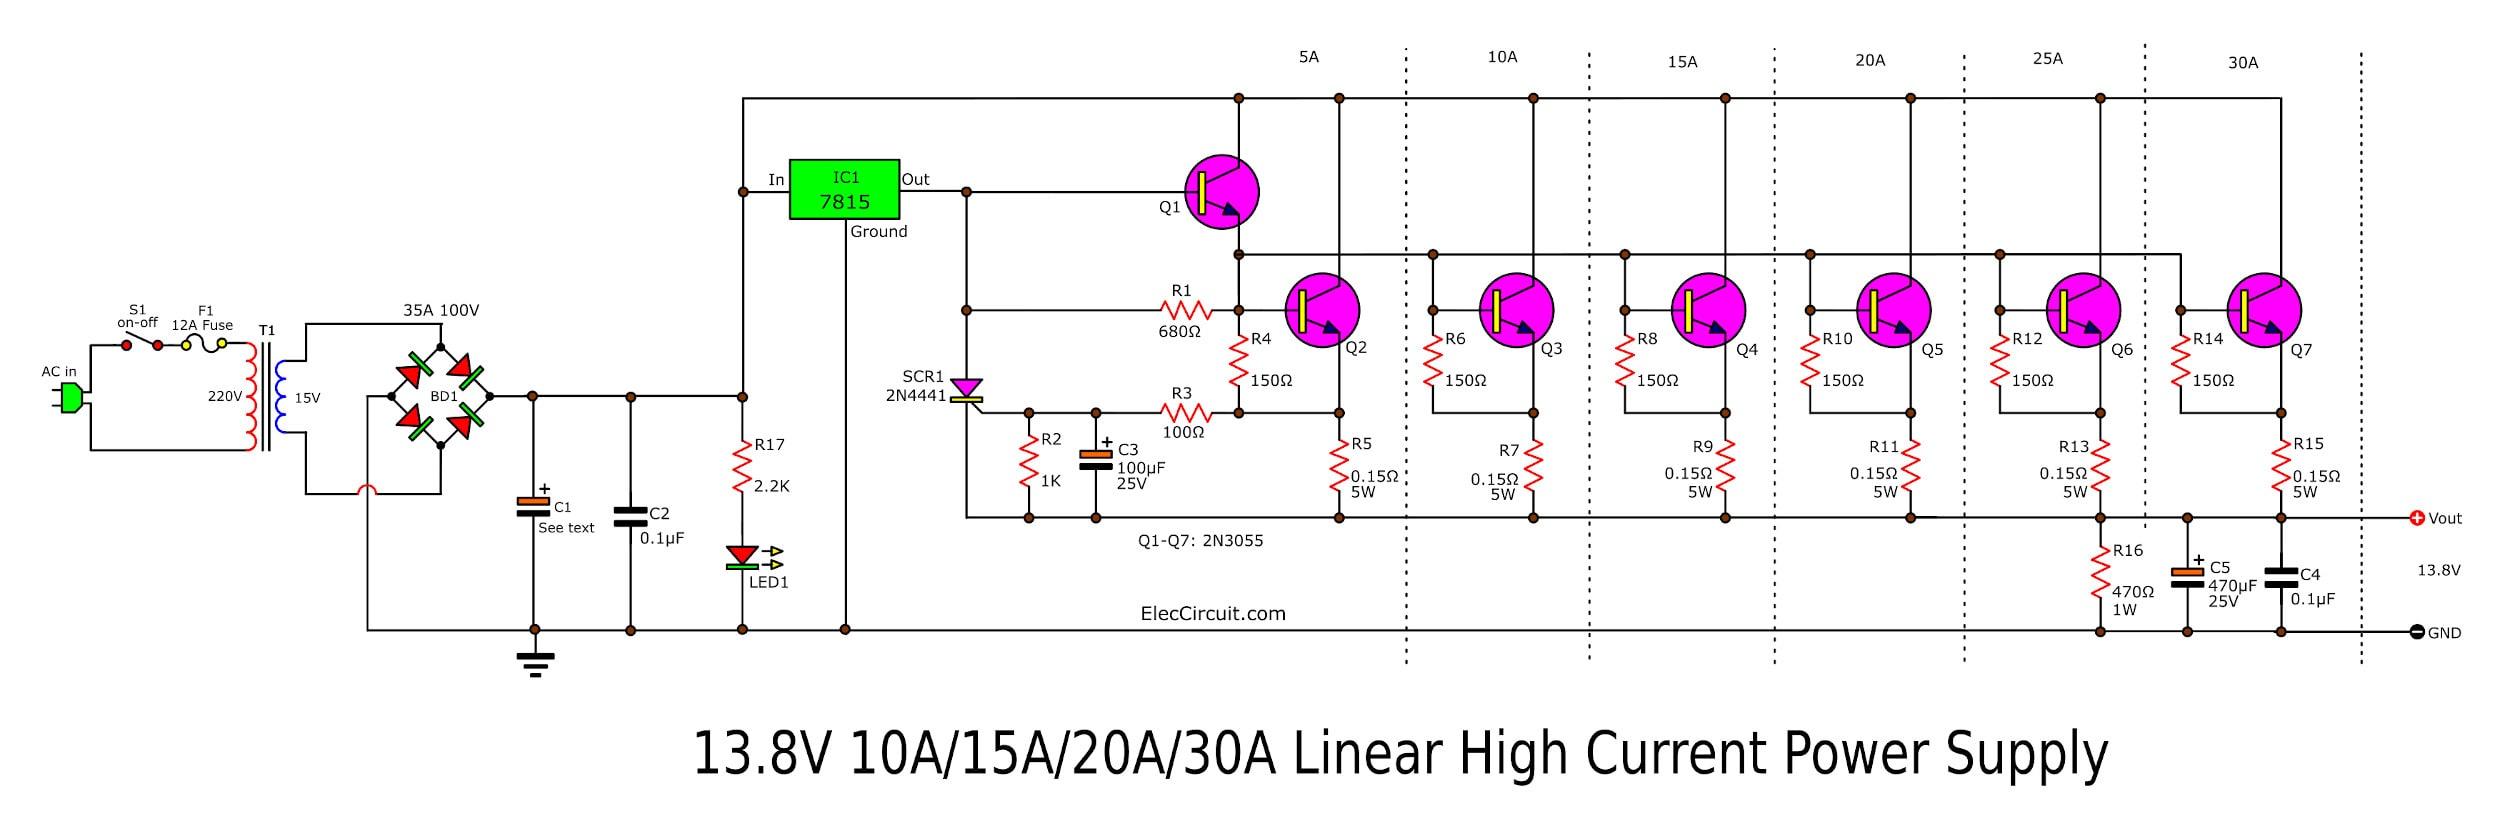 high current 13.8v 30a 25a 20a 15a power supply